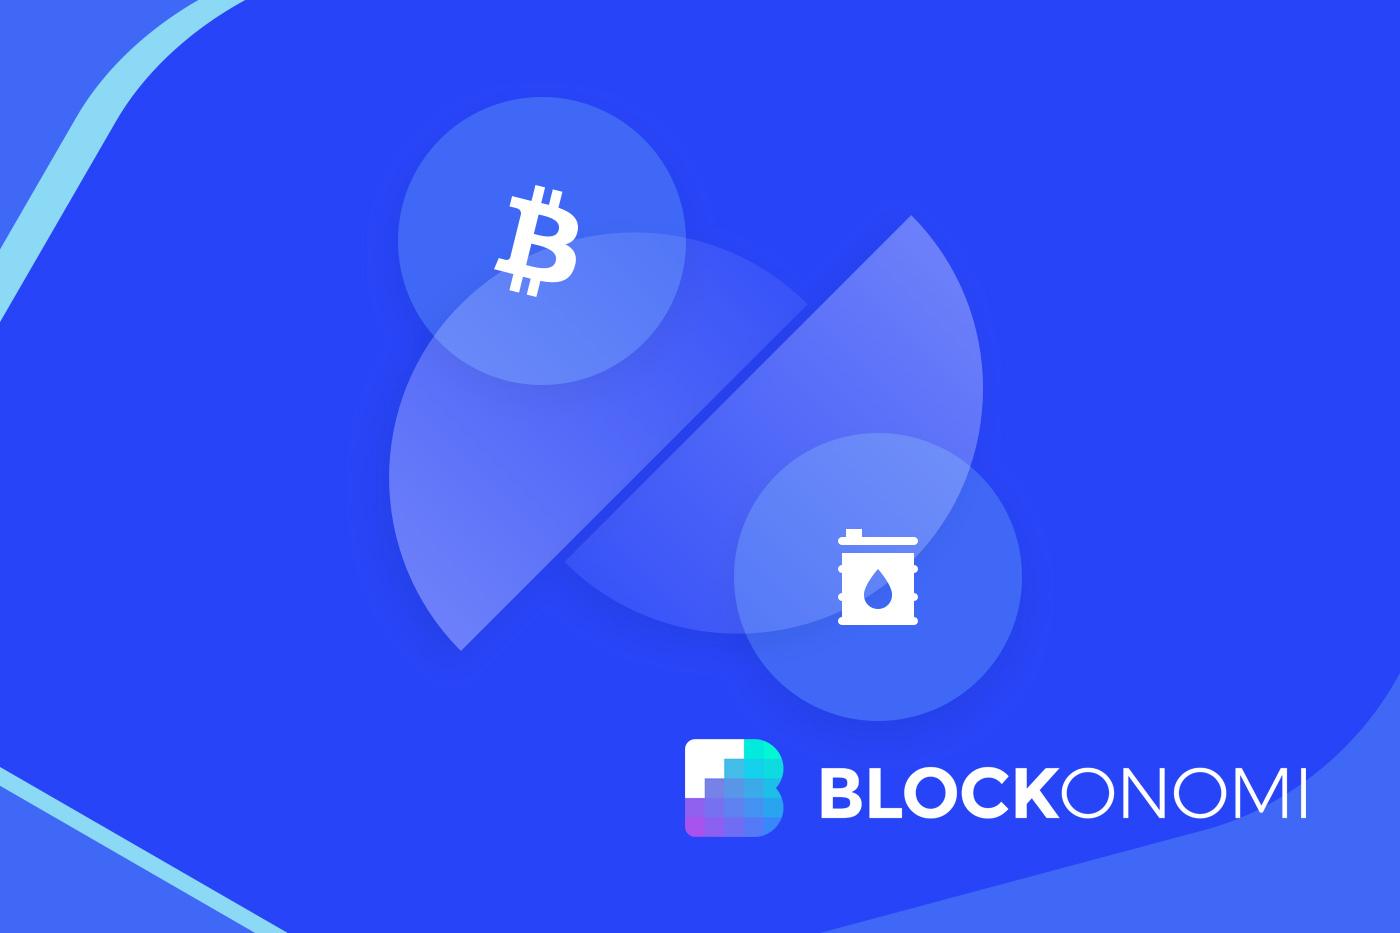 Universal Bitcoin